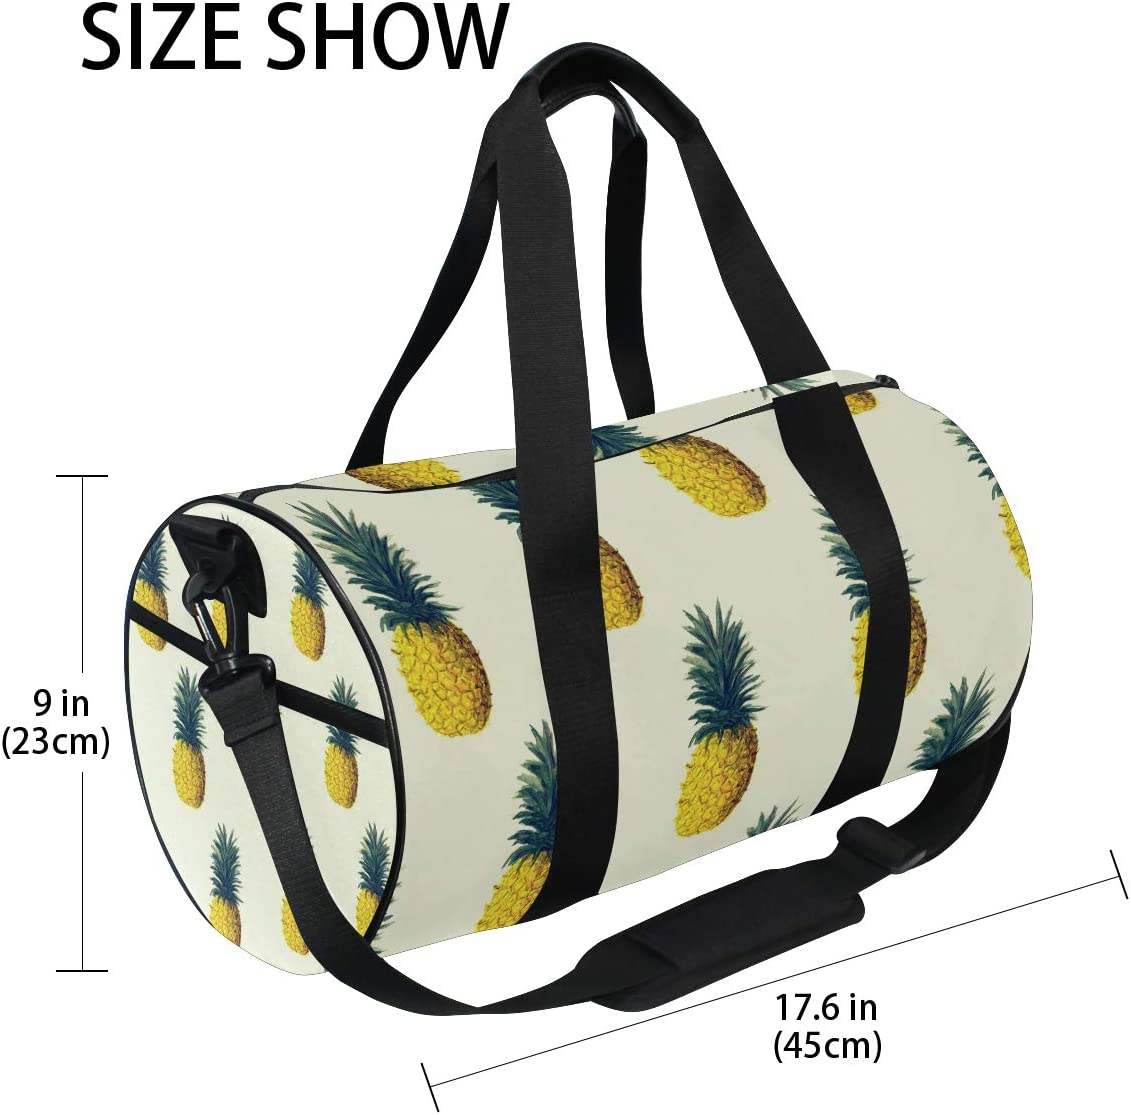 OuLian Duffel Bag Pineapple Fire Women Garment Gym Tote Bag Best Sports Bag for Boys